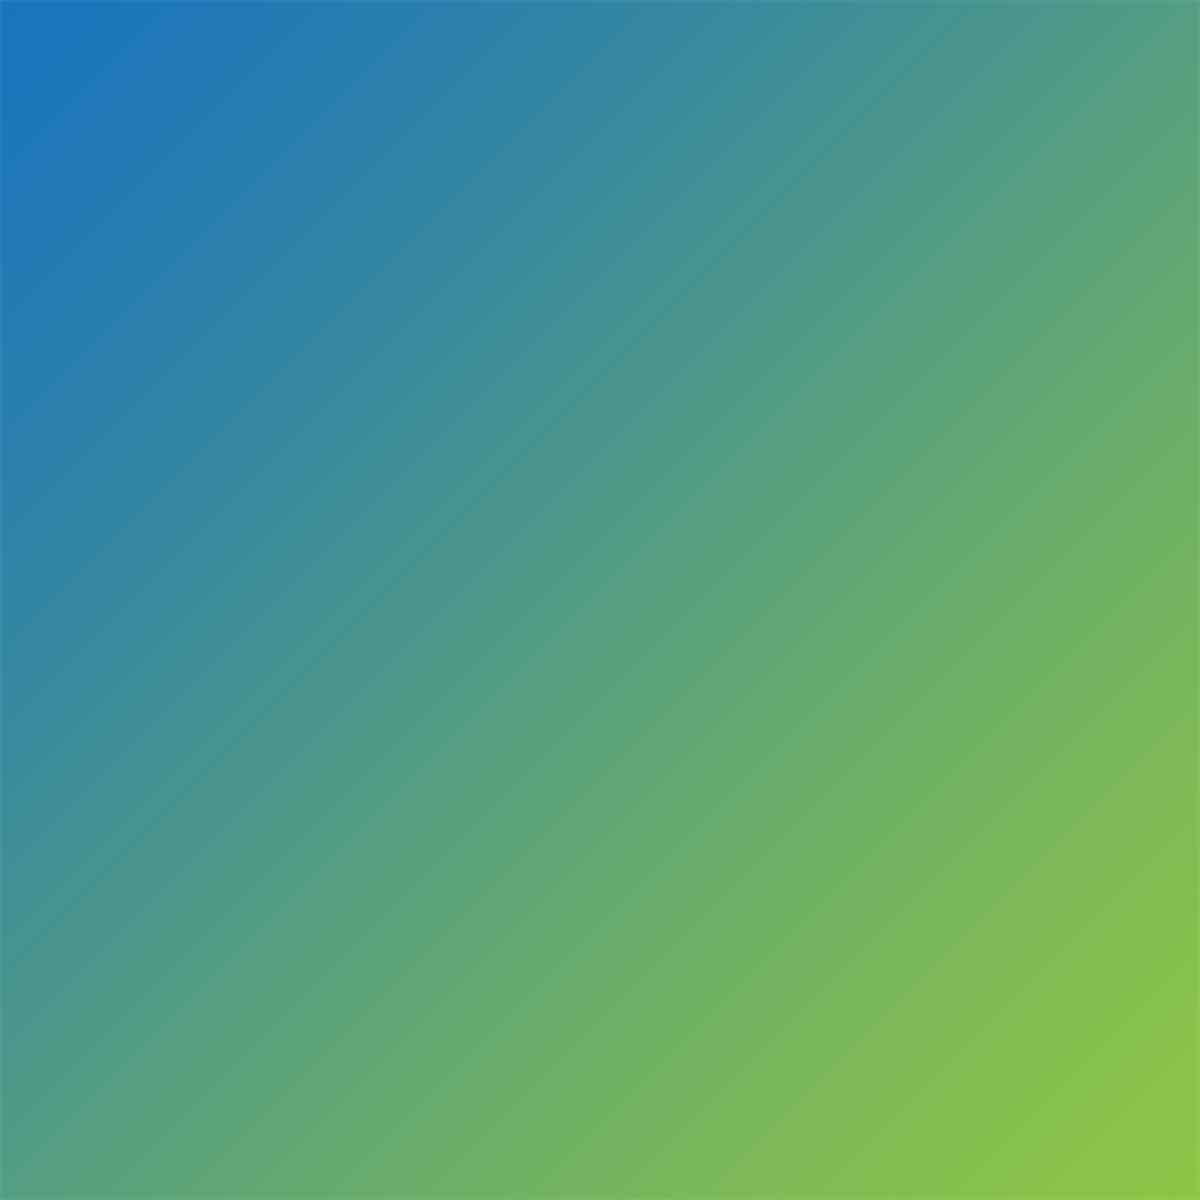 https://www.geziantalya.com/wp-content/uploads/2018/09/bgn-image-box-gradient.jpg